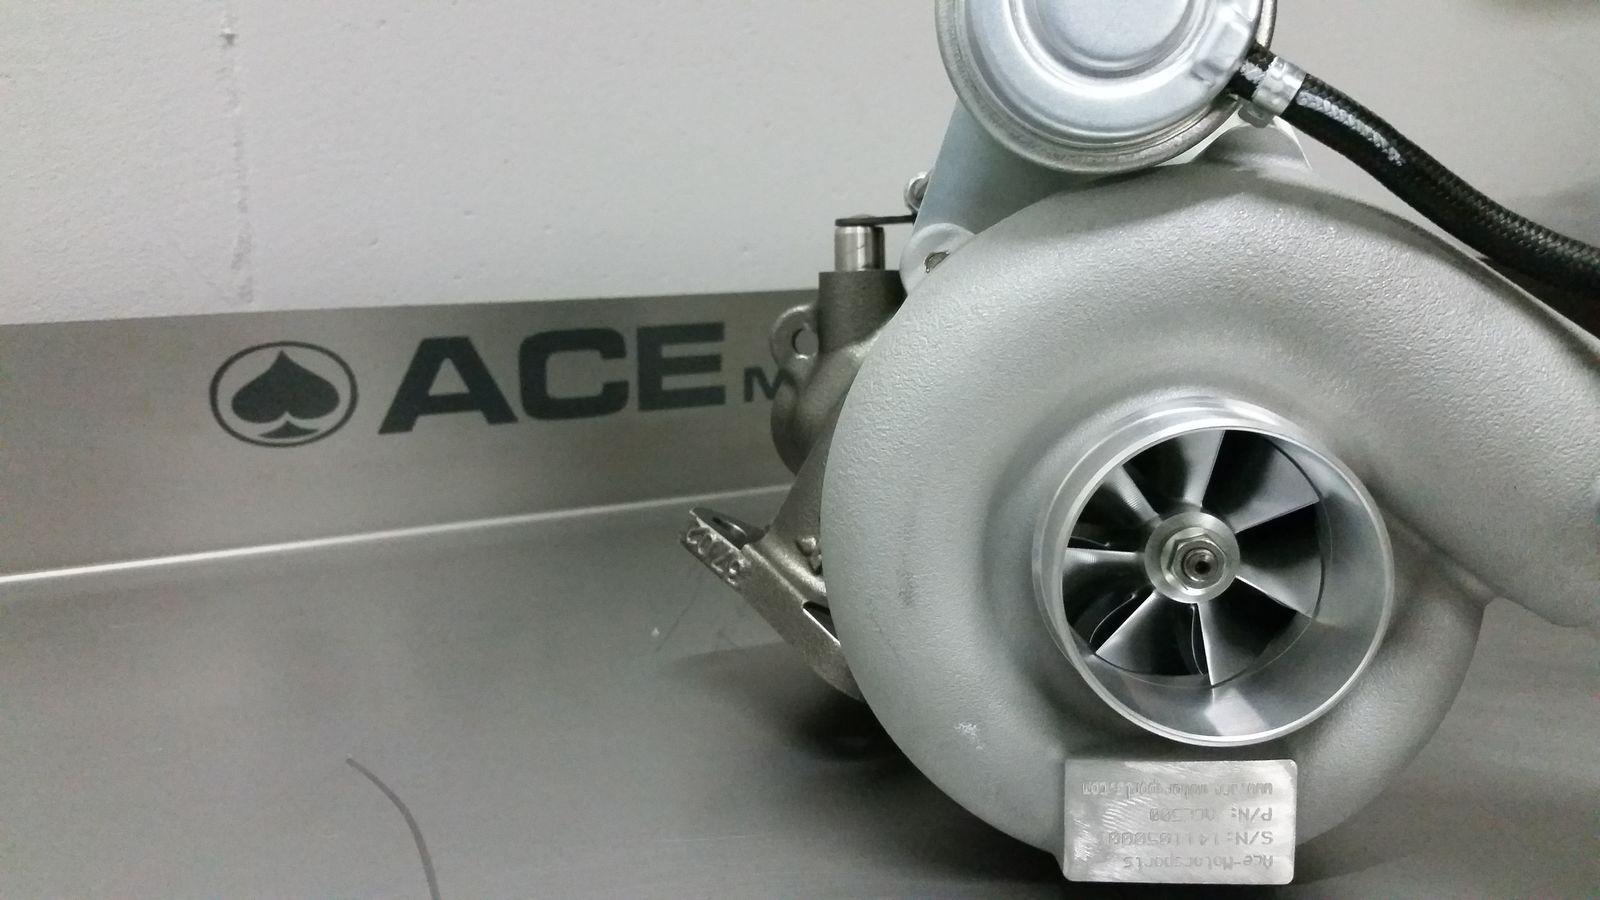 ACE450 bolt on turbo for Subaru